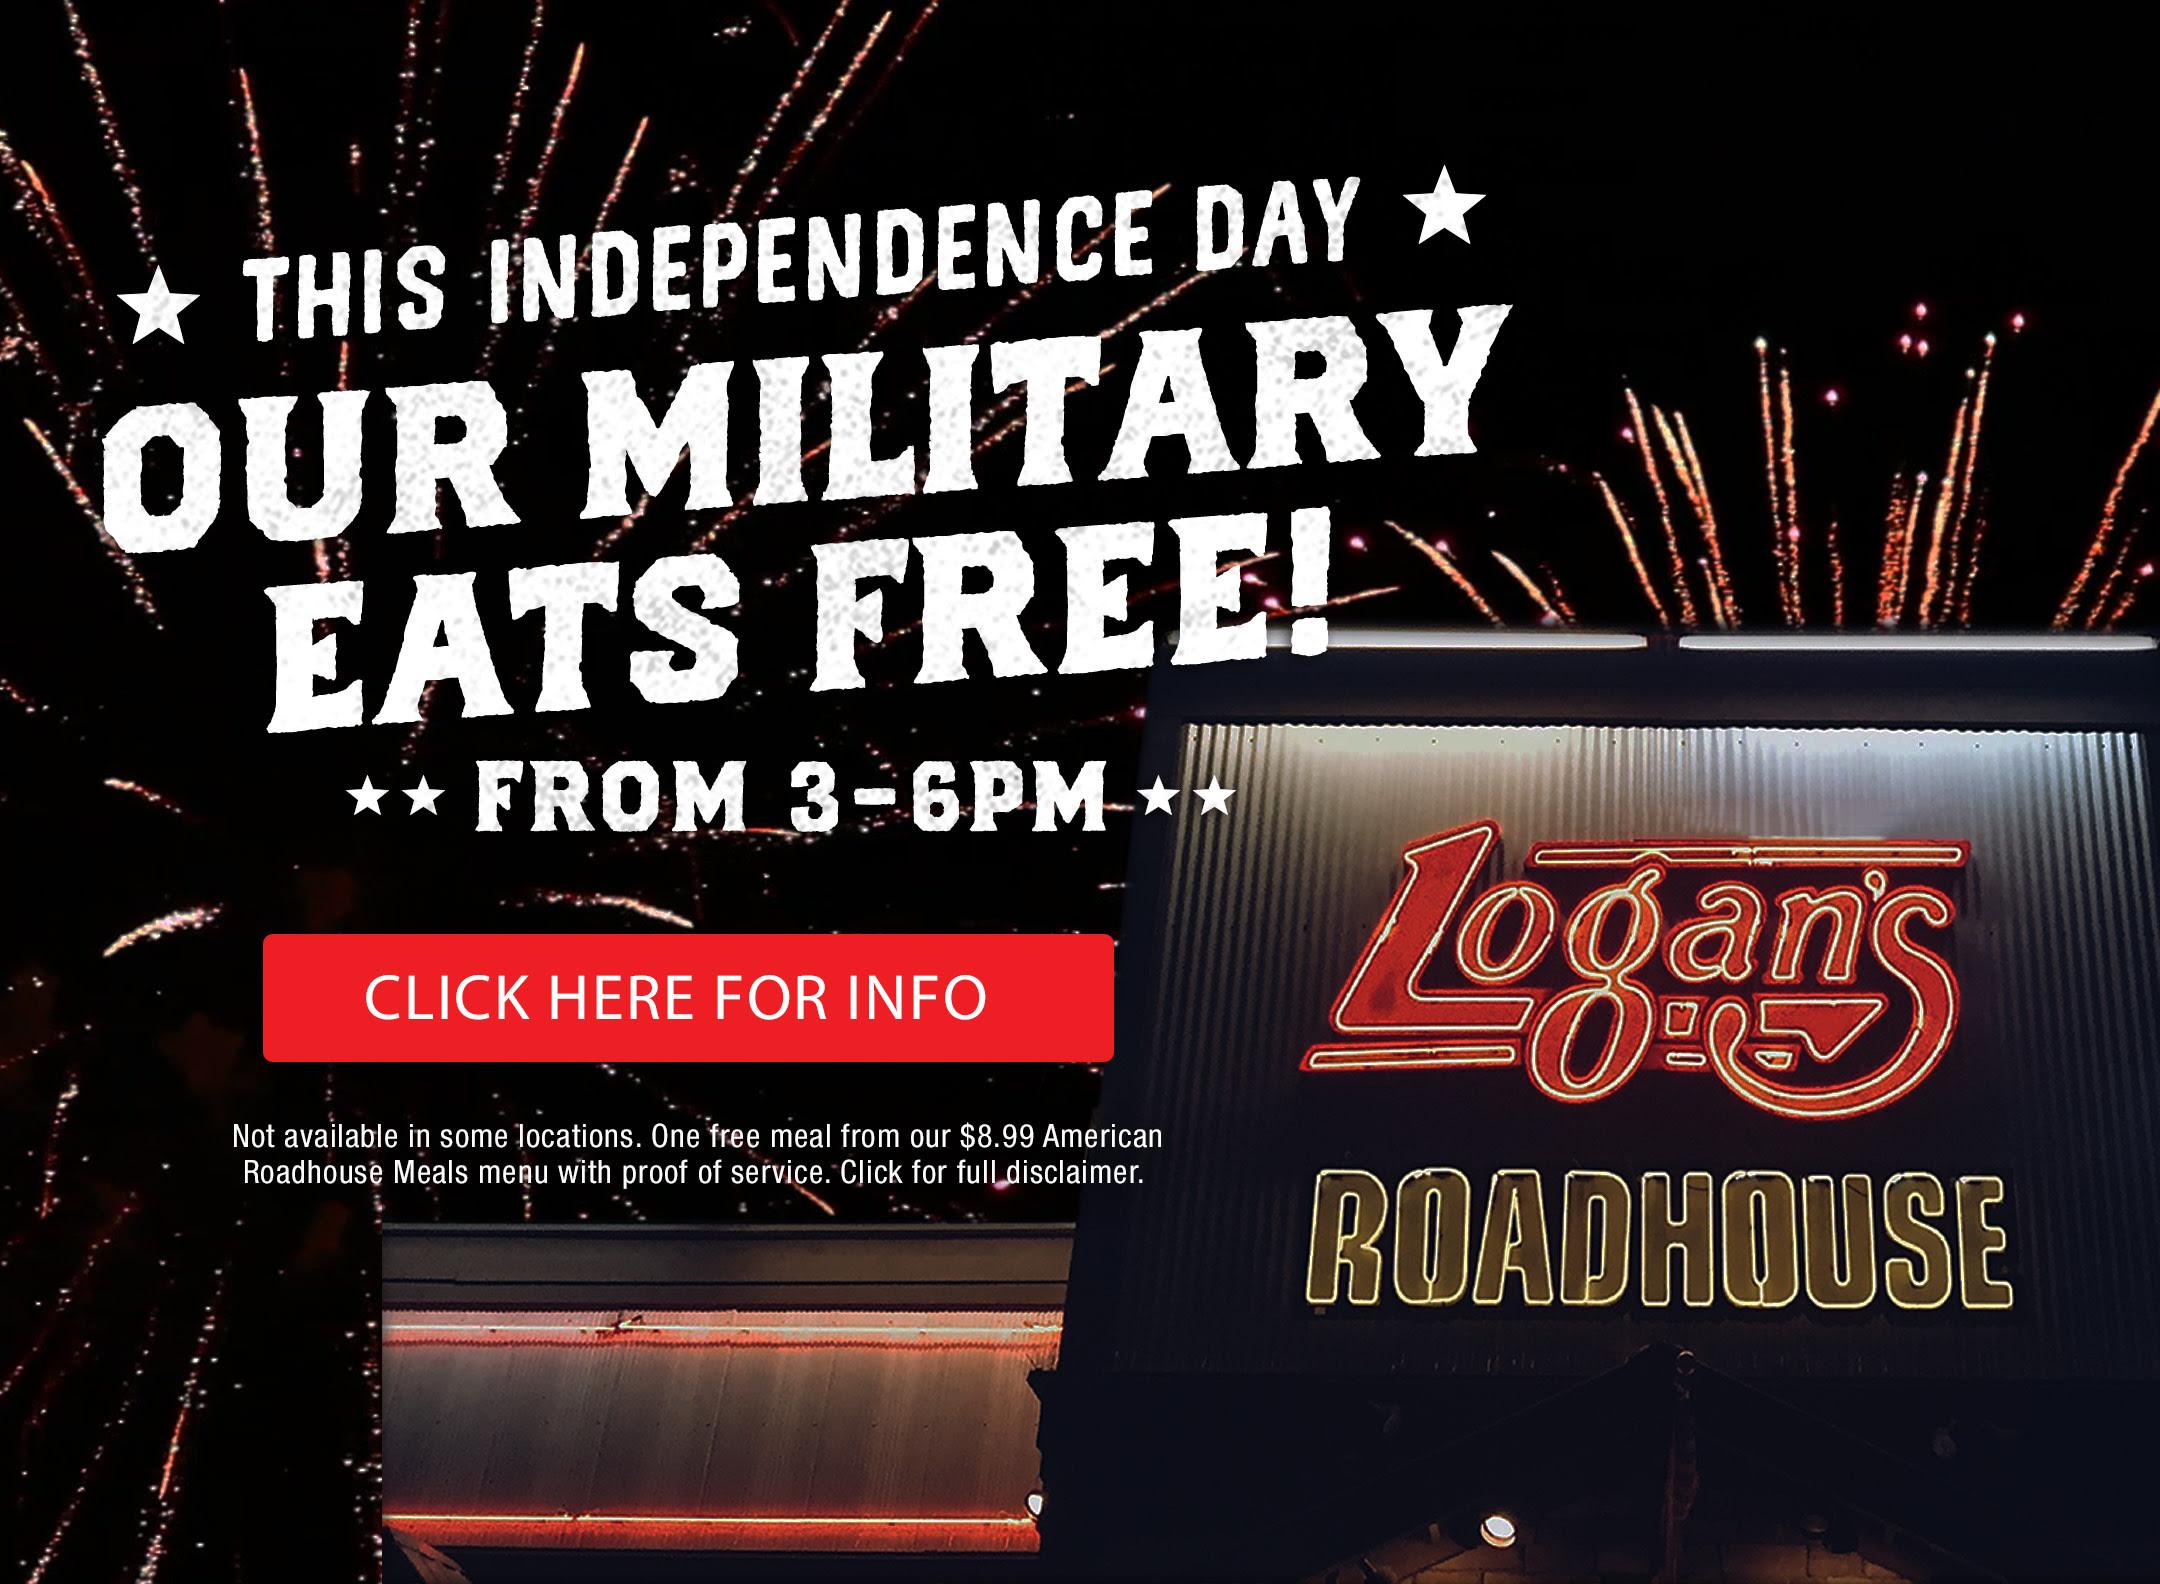 Logans Roadhouse Fontana California